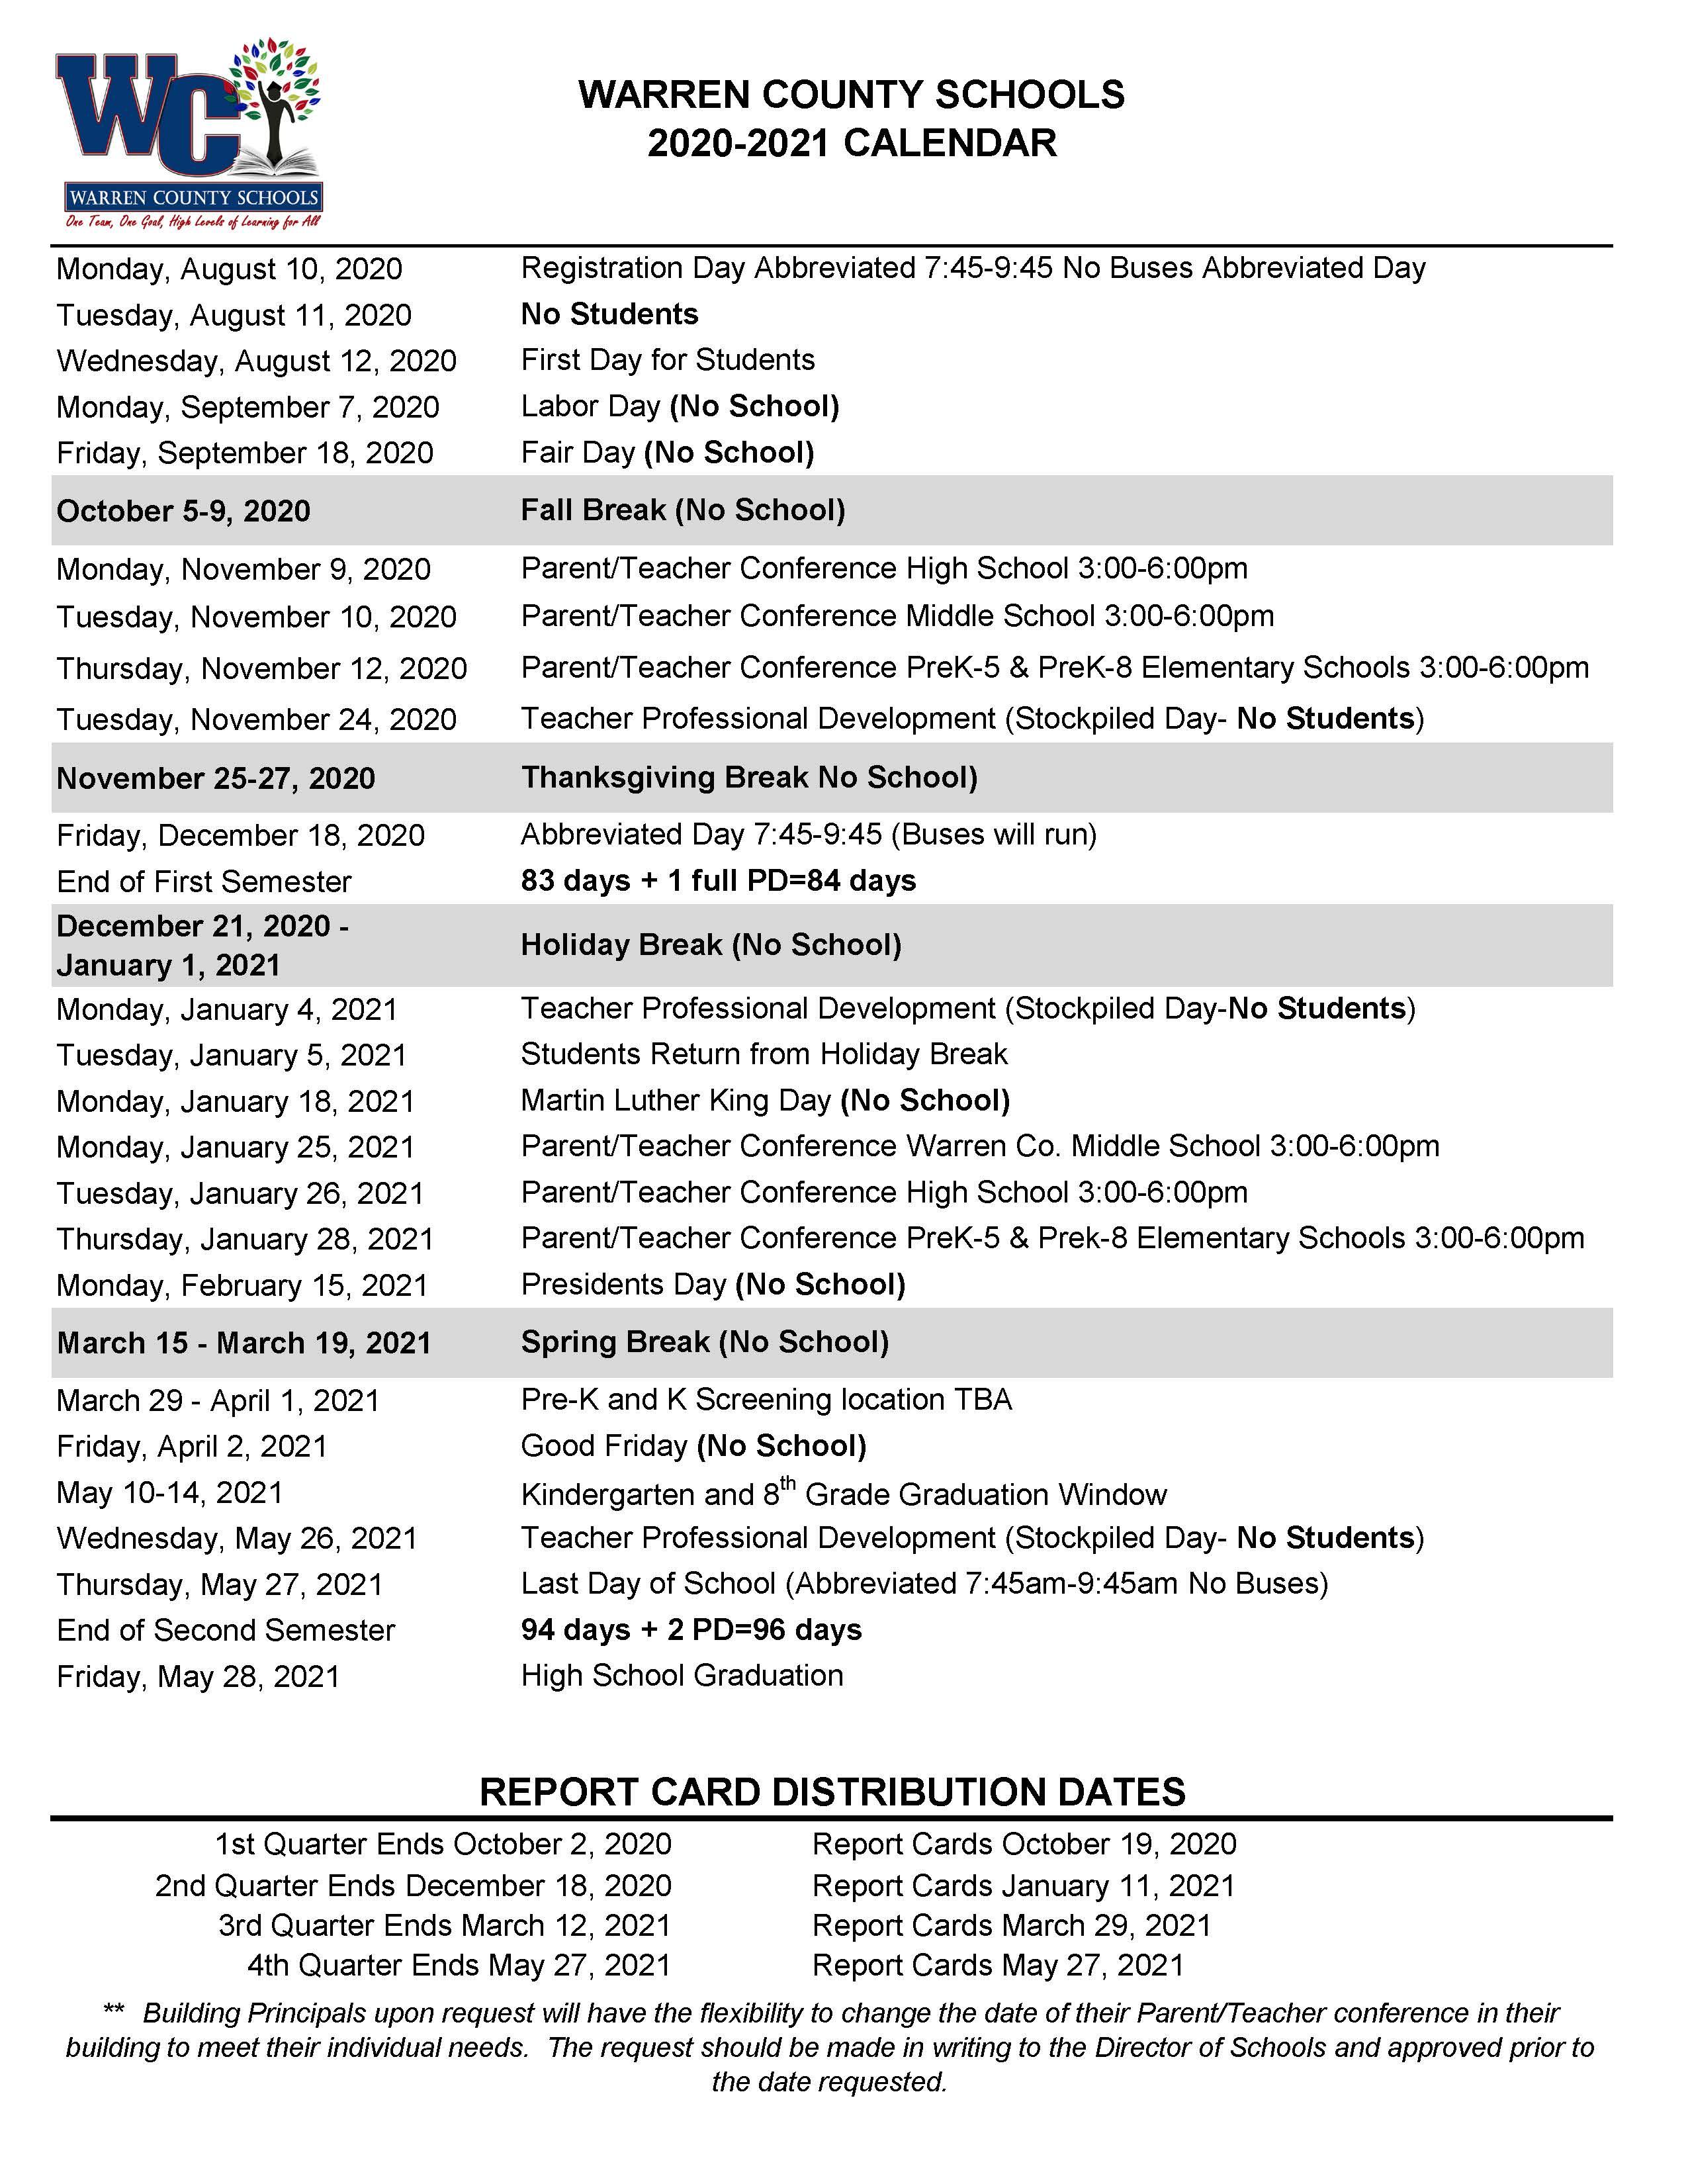 Home – Regarding West Clark Community School Calendar 2021 20